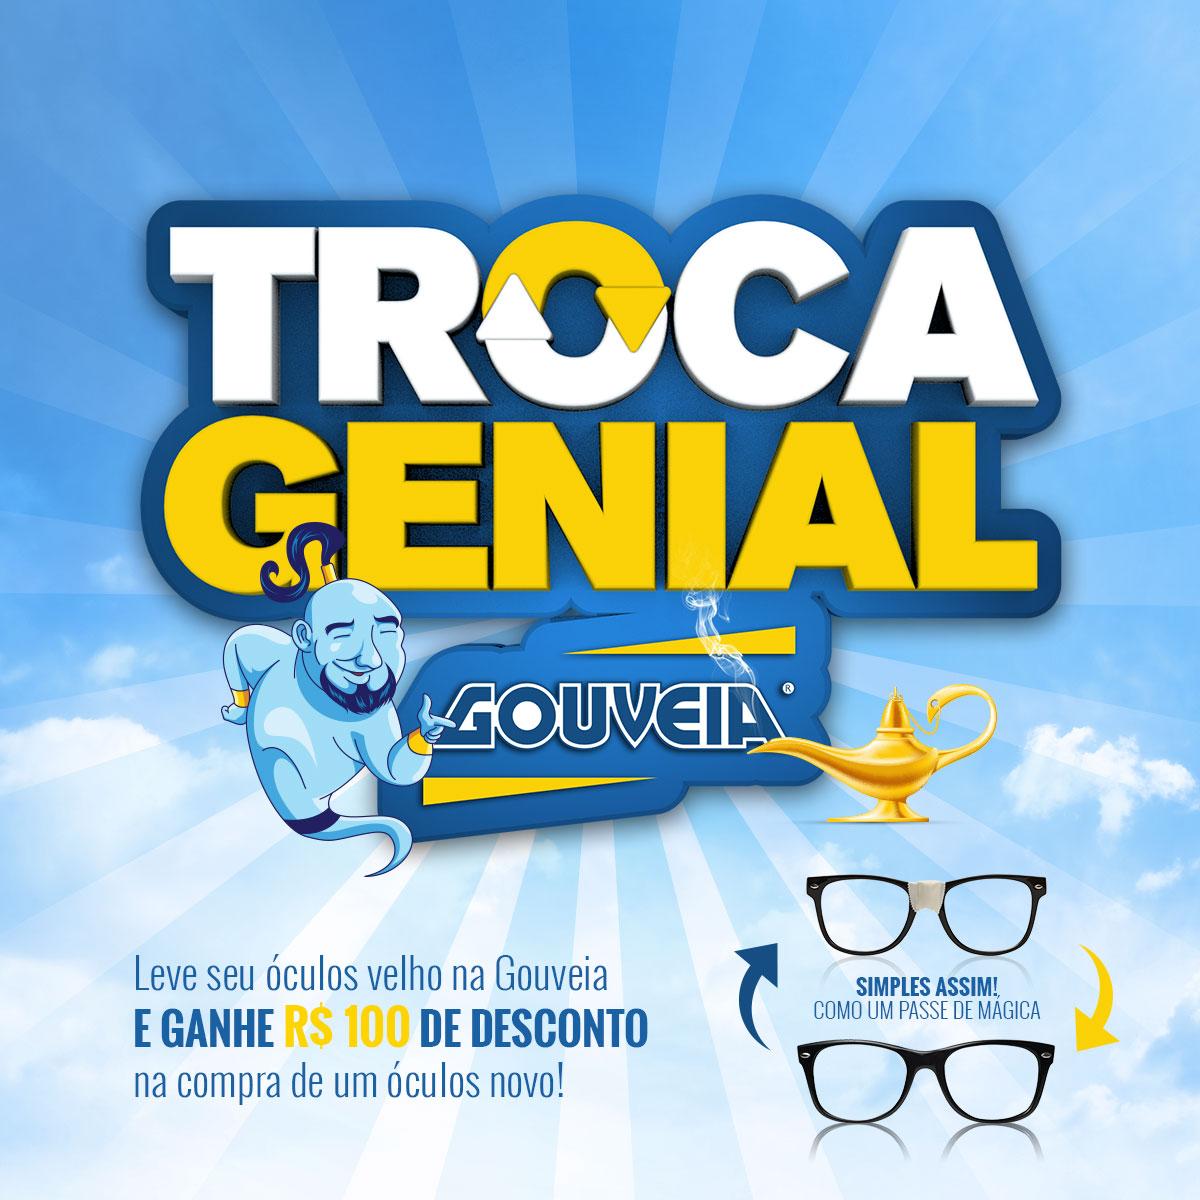 Troca-Genial-Gouveia